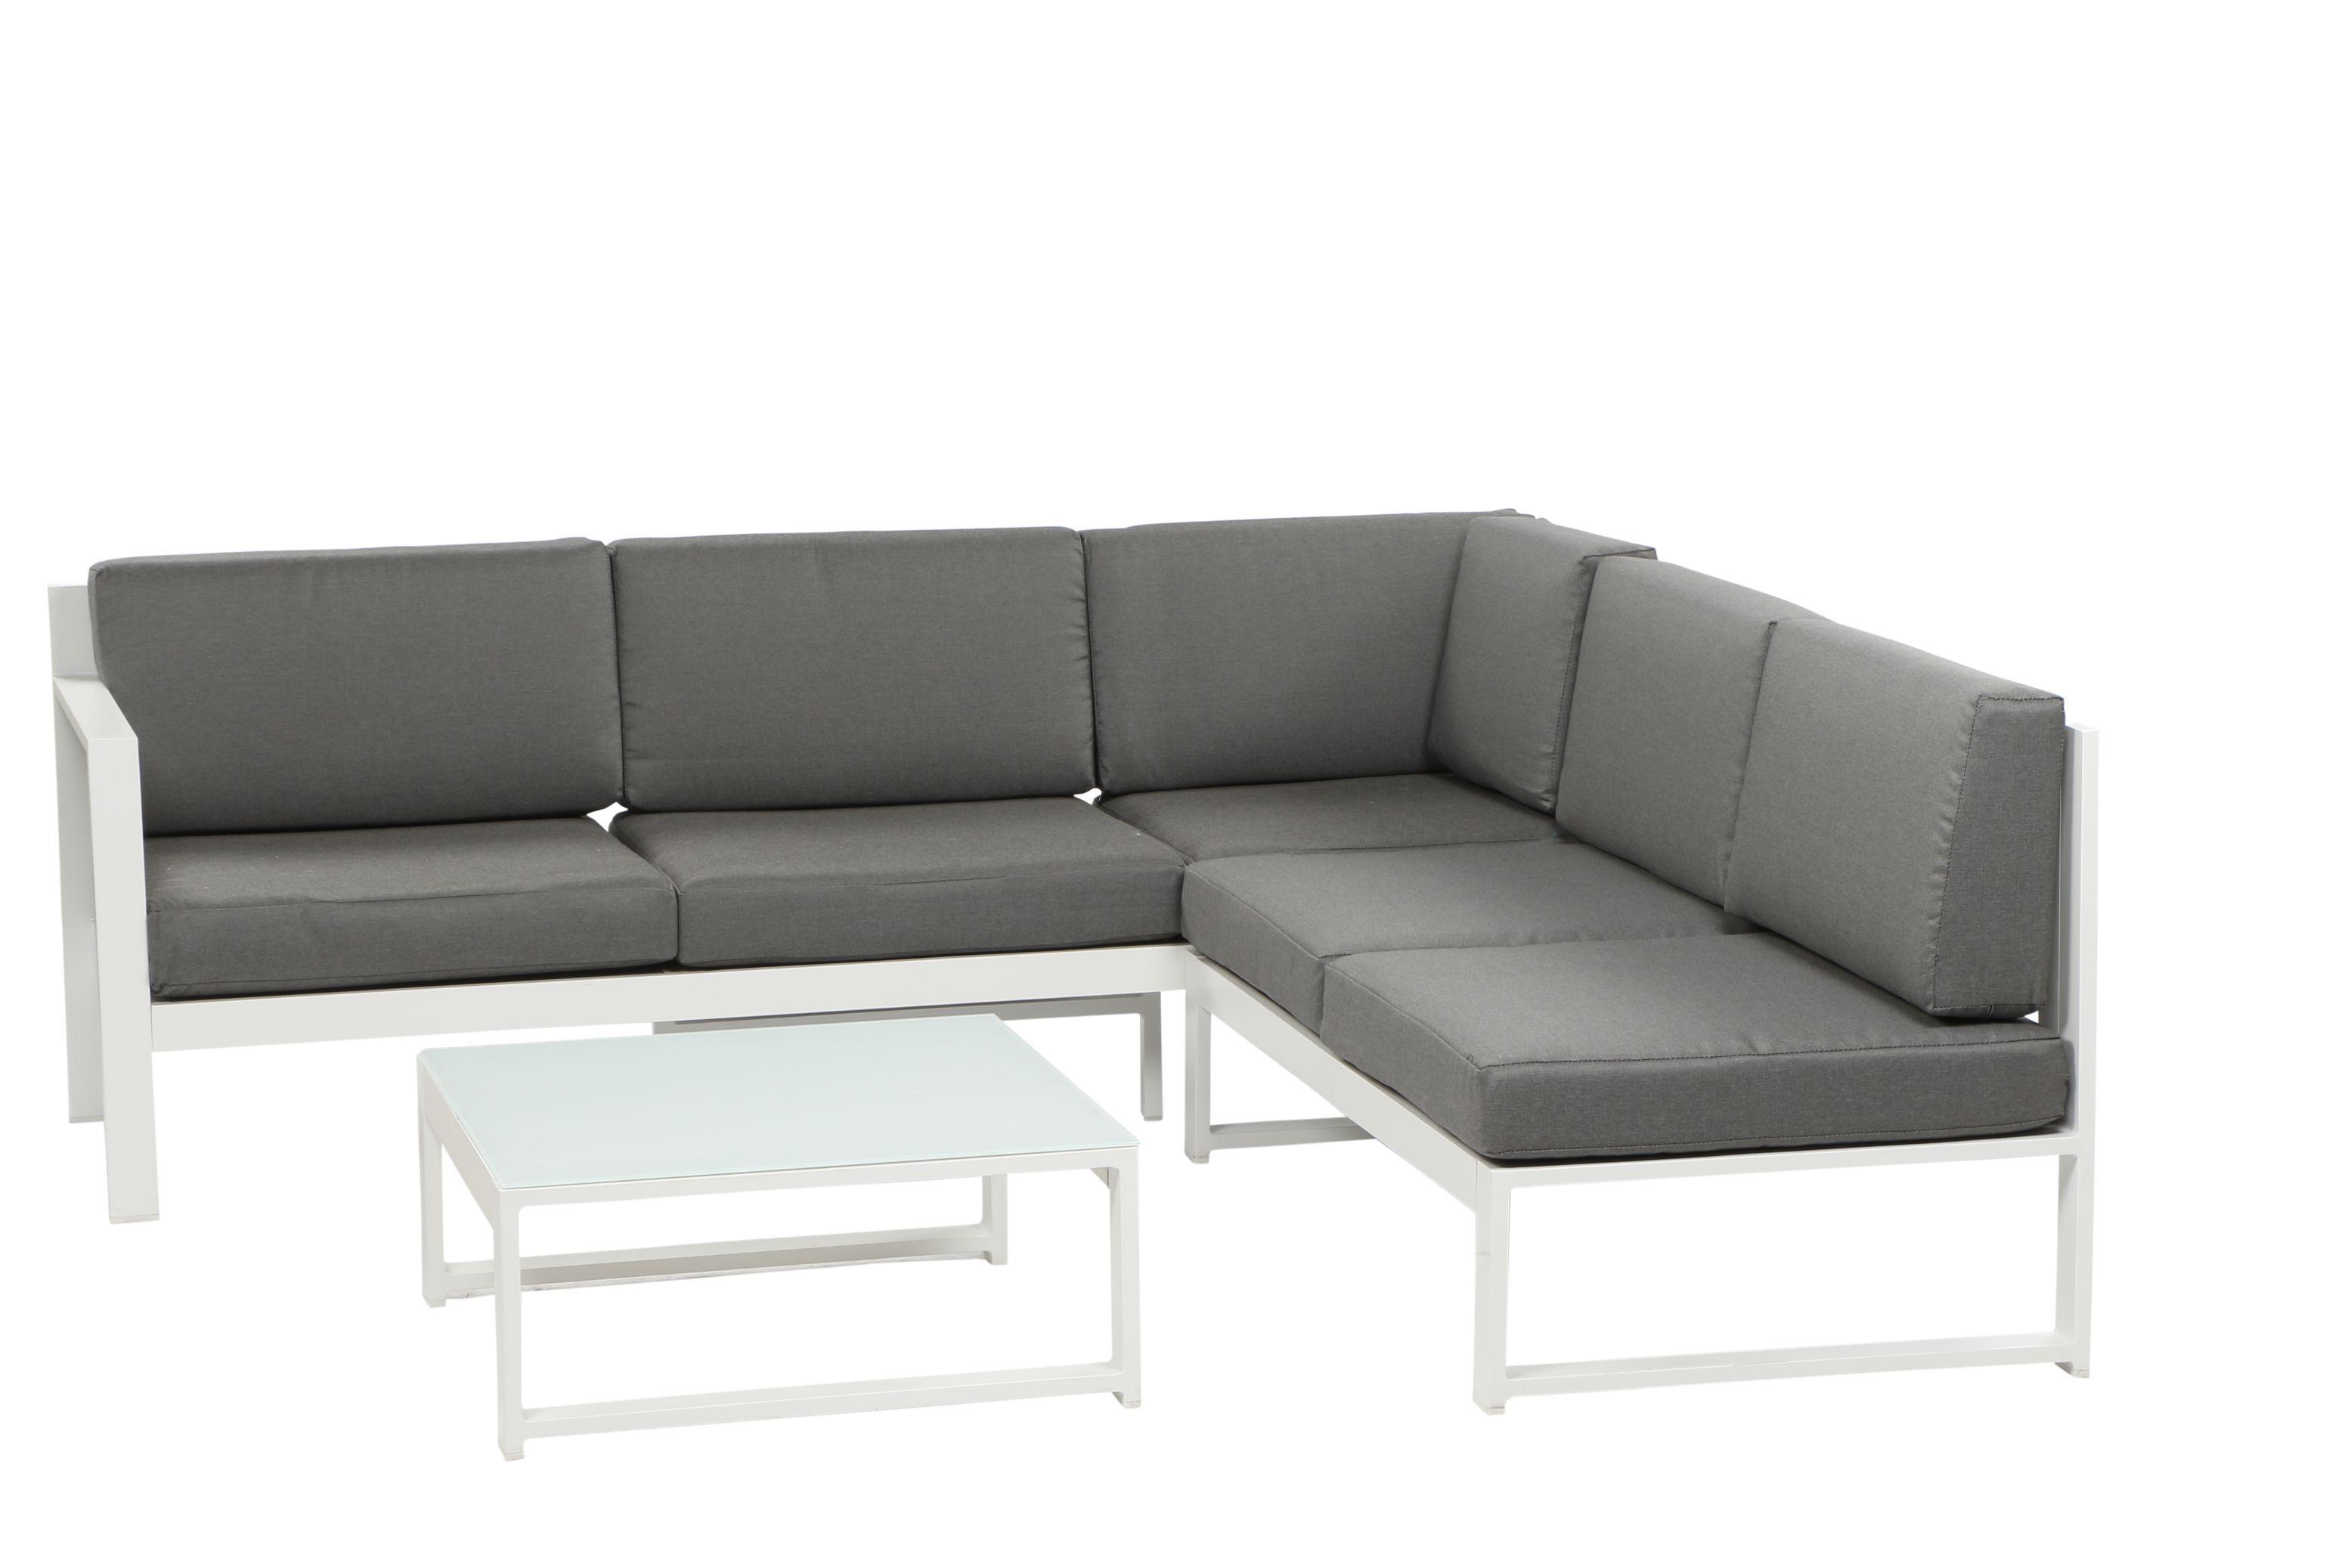 FILIO Aluminium Ecklounge Gartenmöbel Set Sitzgruppe weiß ...